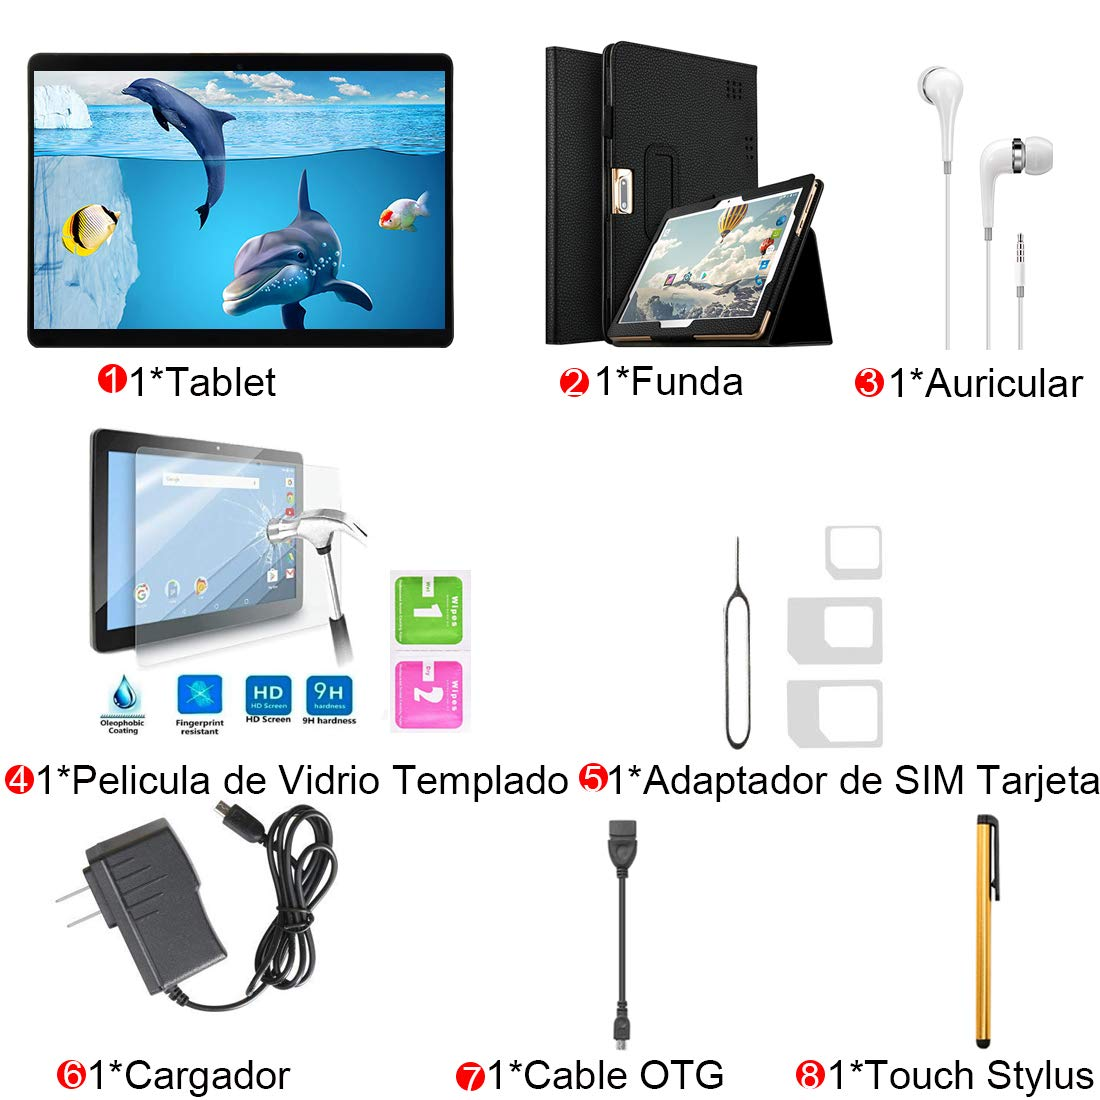 Tablets 10 Pulgadas 4G Dual SIM/WiFi 32GB ROM 2GB RAM (Netflix y Office Están Instalados) Android 7.0 8MP Caméra 7000mAh Batería Bluetooth/OTG Voukou T5 Tablets (Negro): Amazon.es: Informática